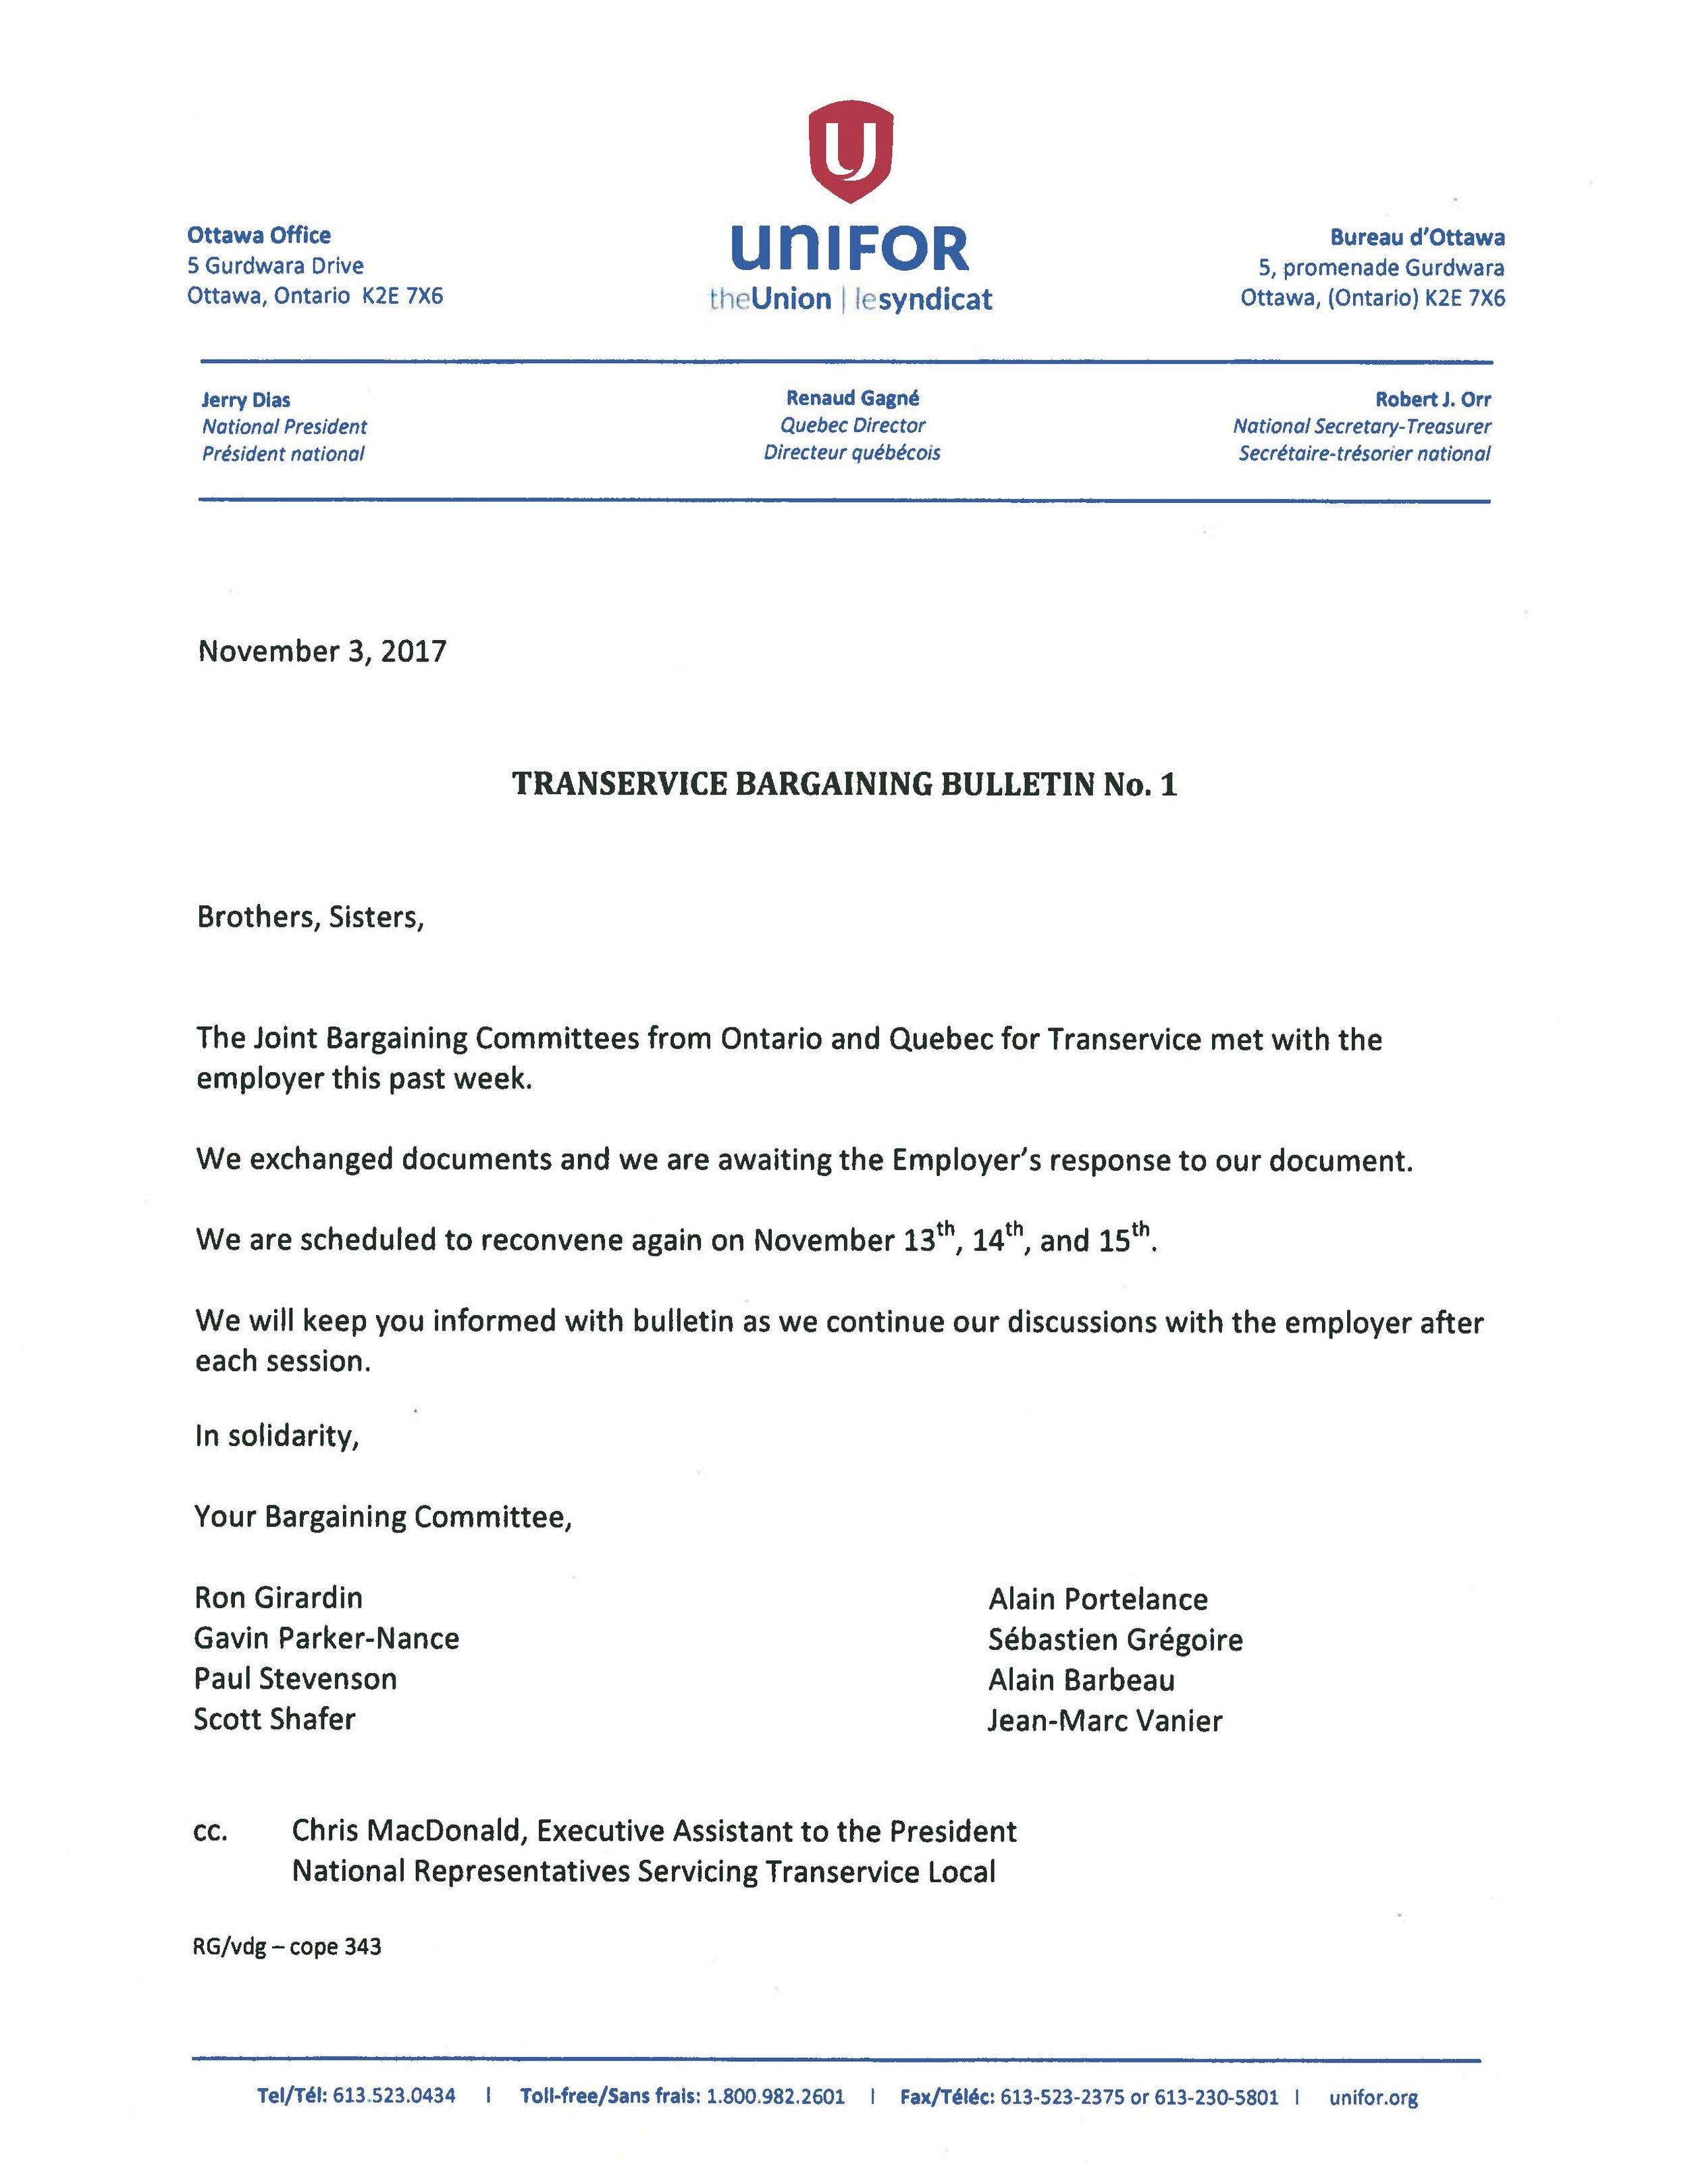 Transervice Bargaining - Bulletin - 01 - 2017-11-03.jpg